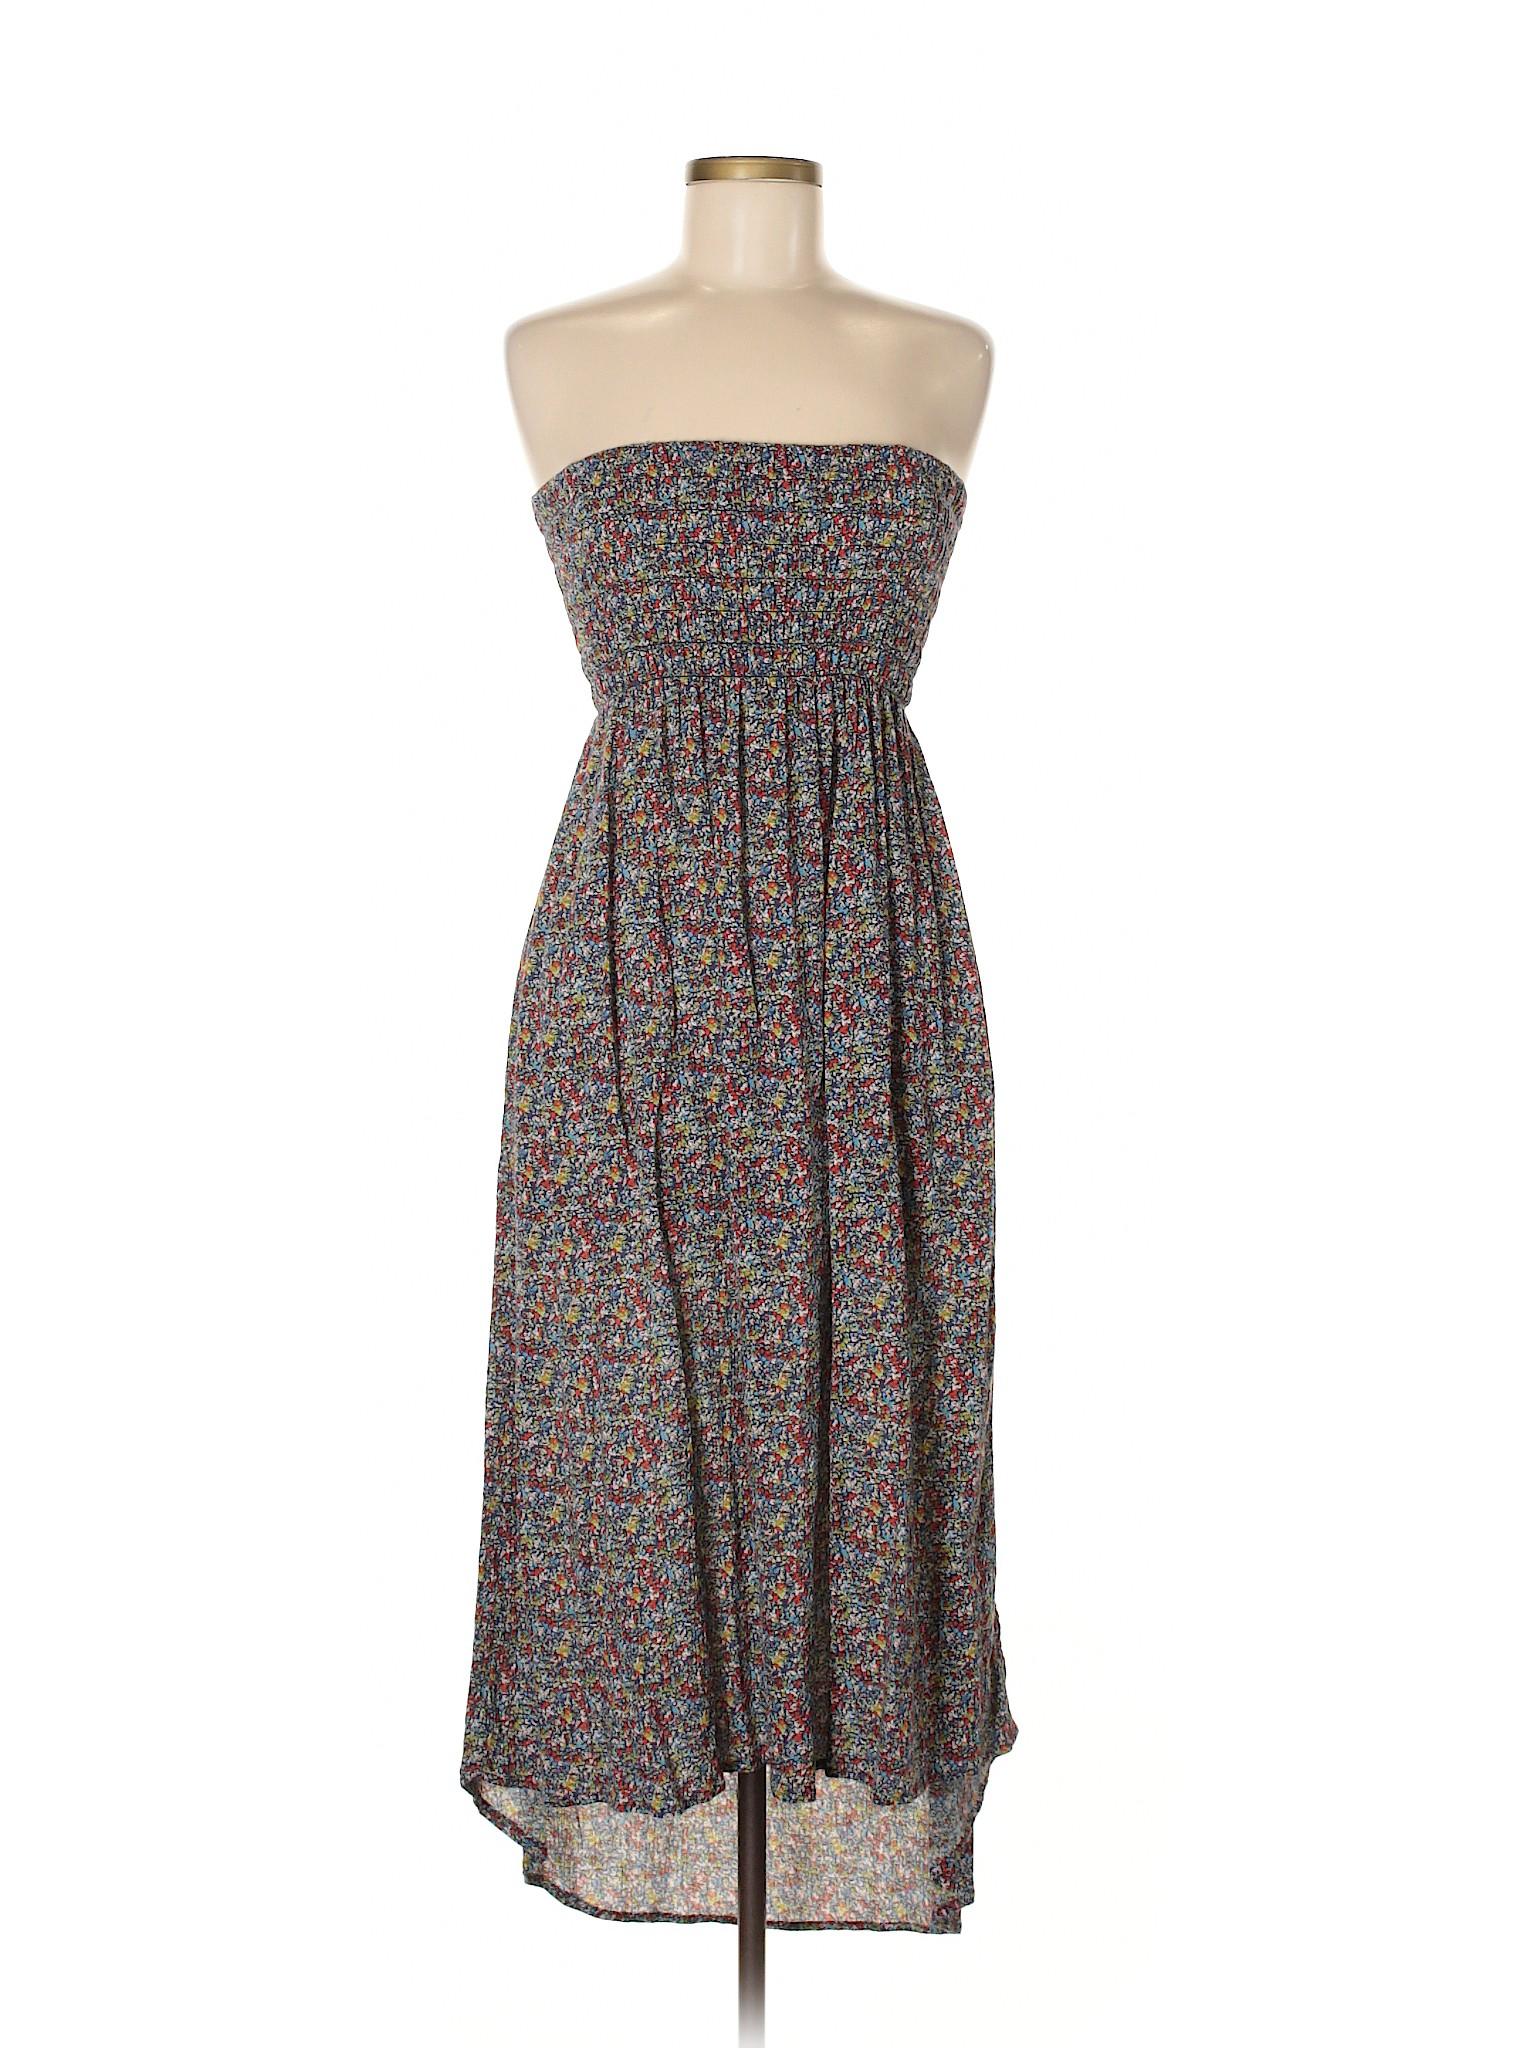 Casual J winter Patterson Dress Kincaid Boutique x6BUqnz